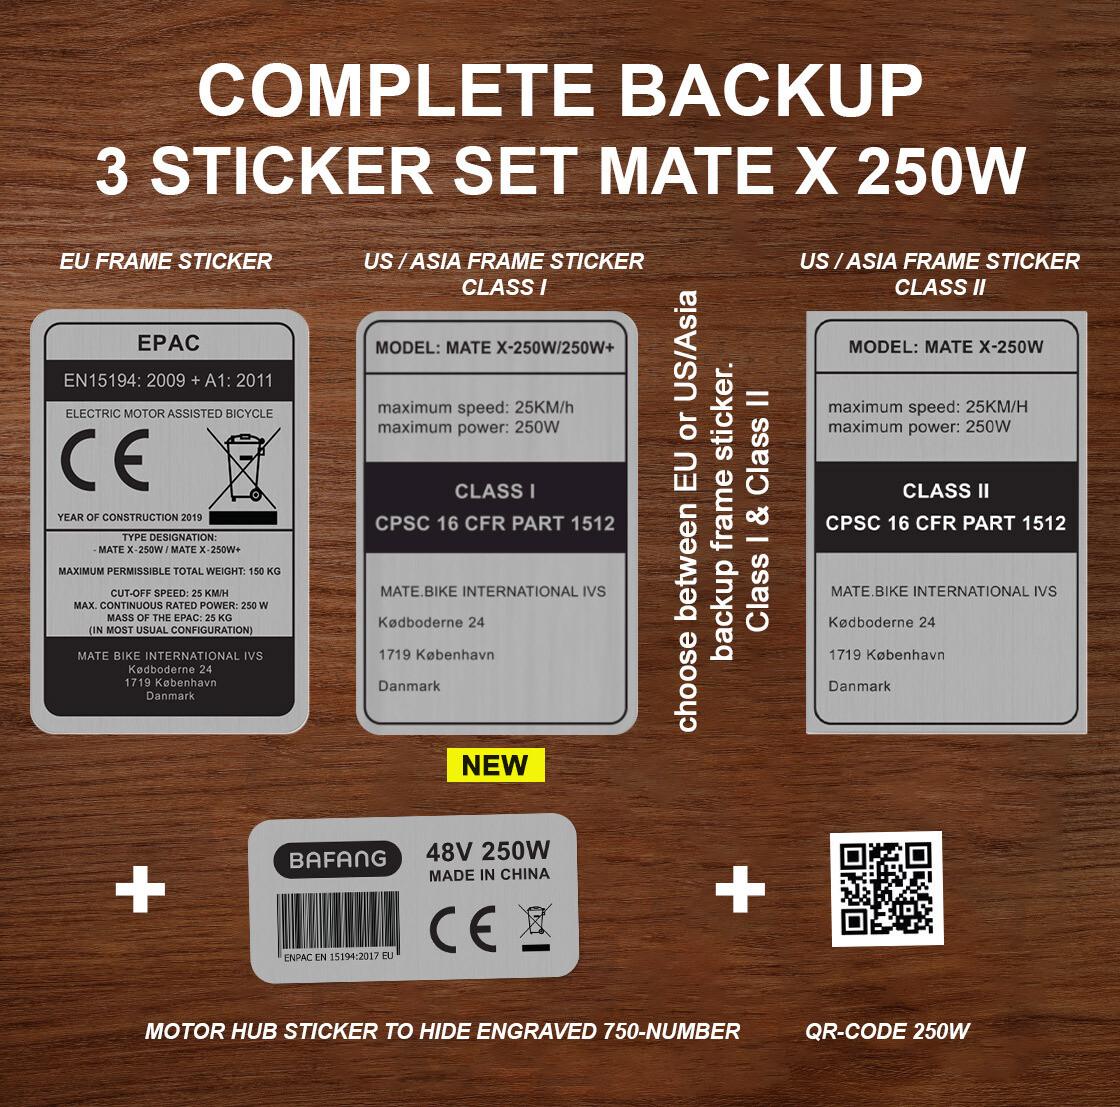 EU & US/ASIA frame sticker 250W versions both Class I & II + QR